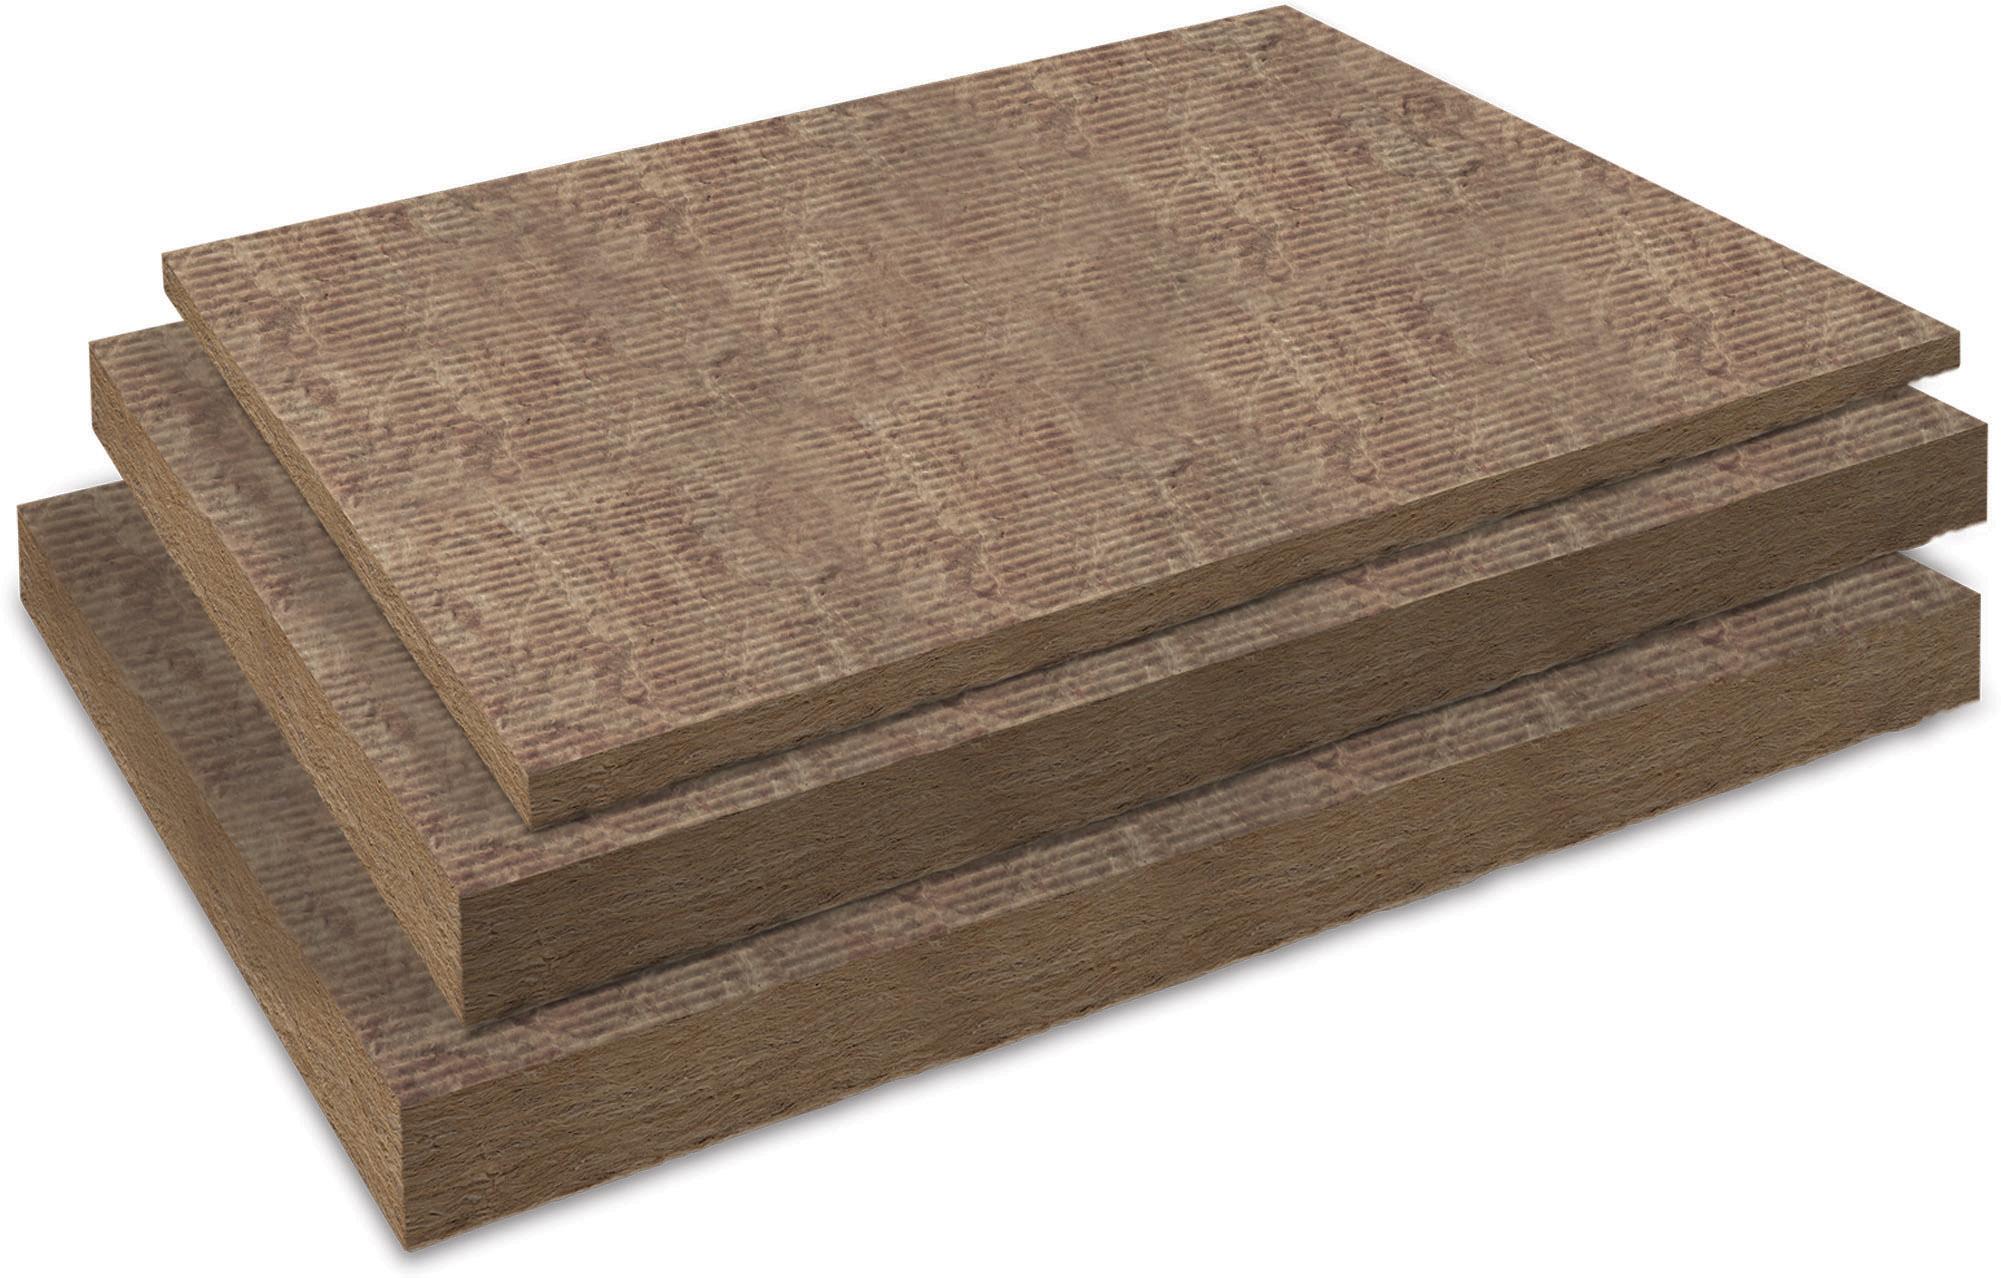 vata minerala bazaltica pentru fatade ventilate knauf. Black Bedroom Furniture Sets. Home Design Ideas